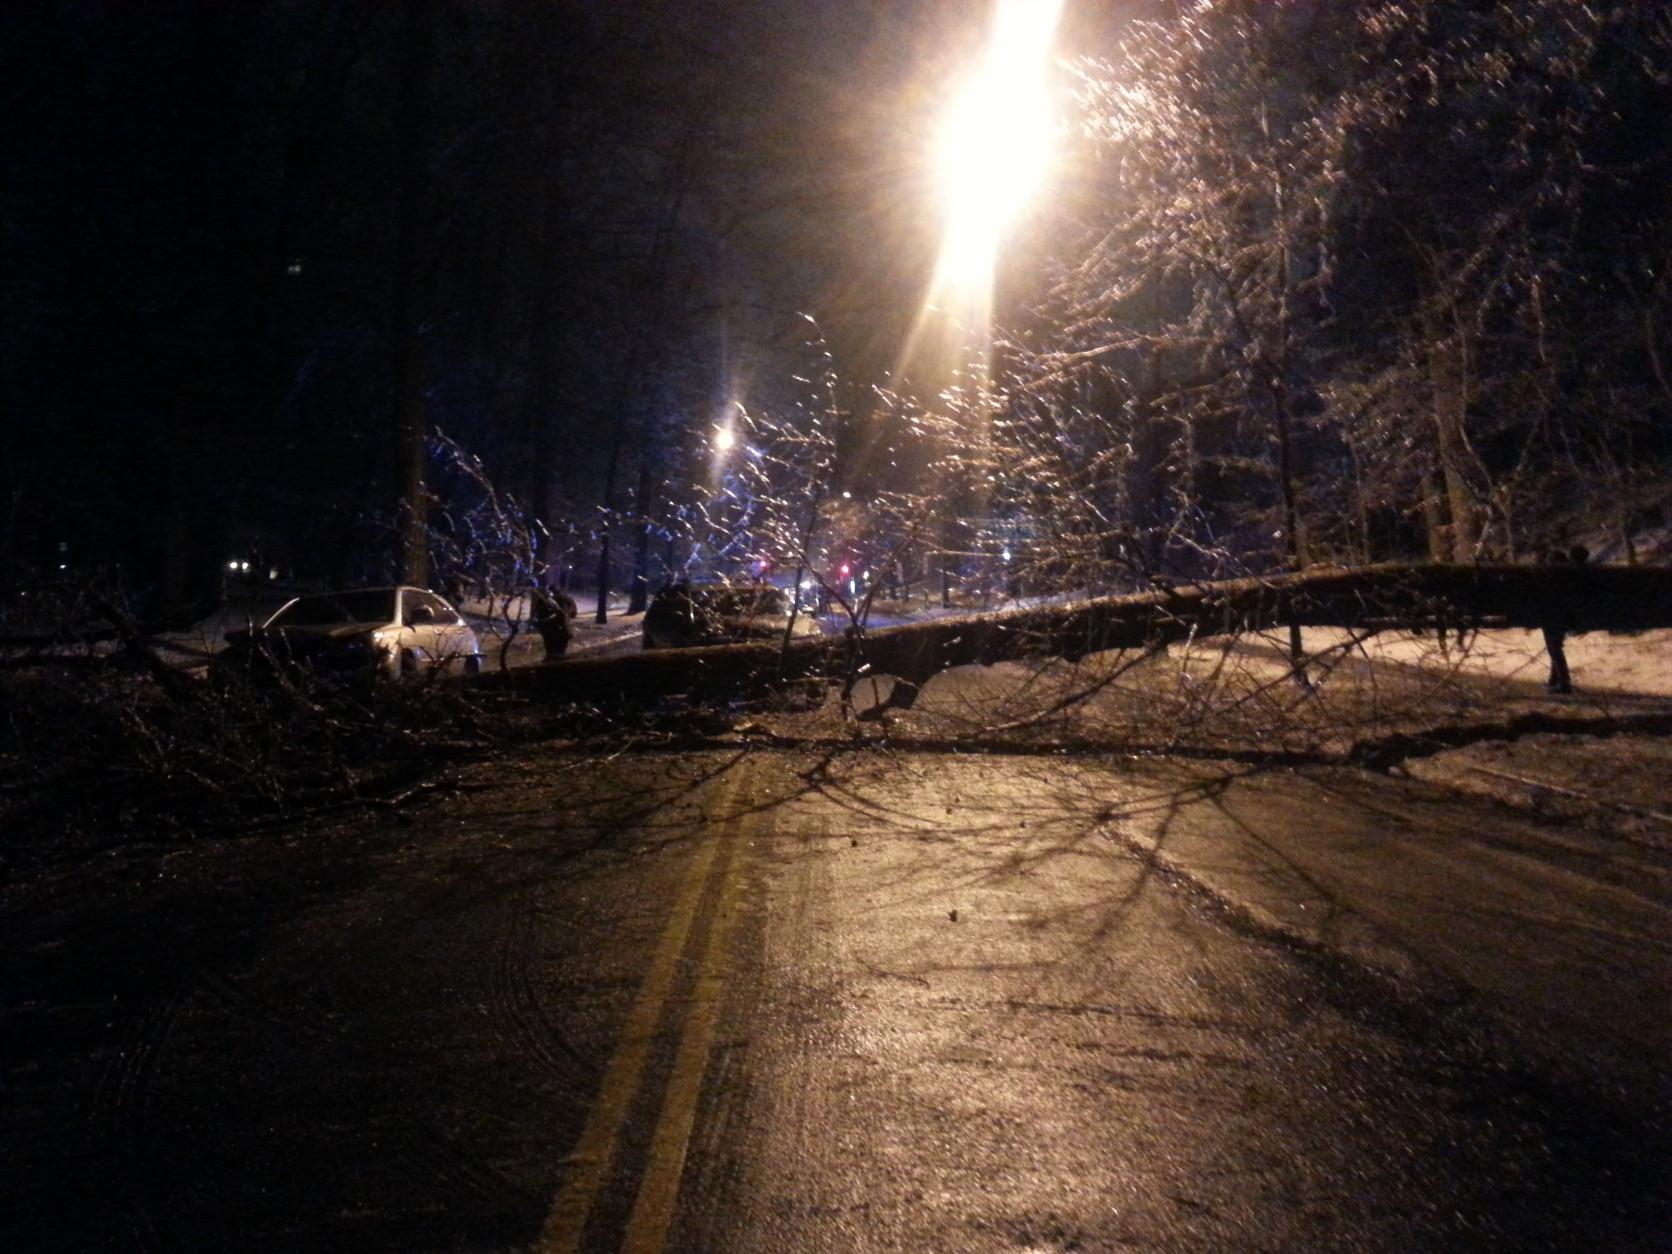 The fallen tree was blocking Massachusetts Avenue near Macomb Street in NW D.C. (WTOP/Rahul Bali)